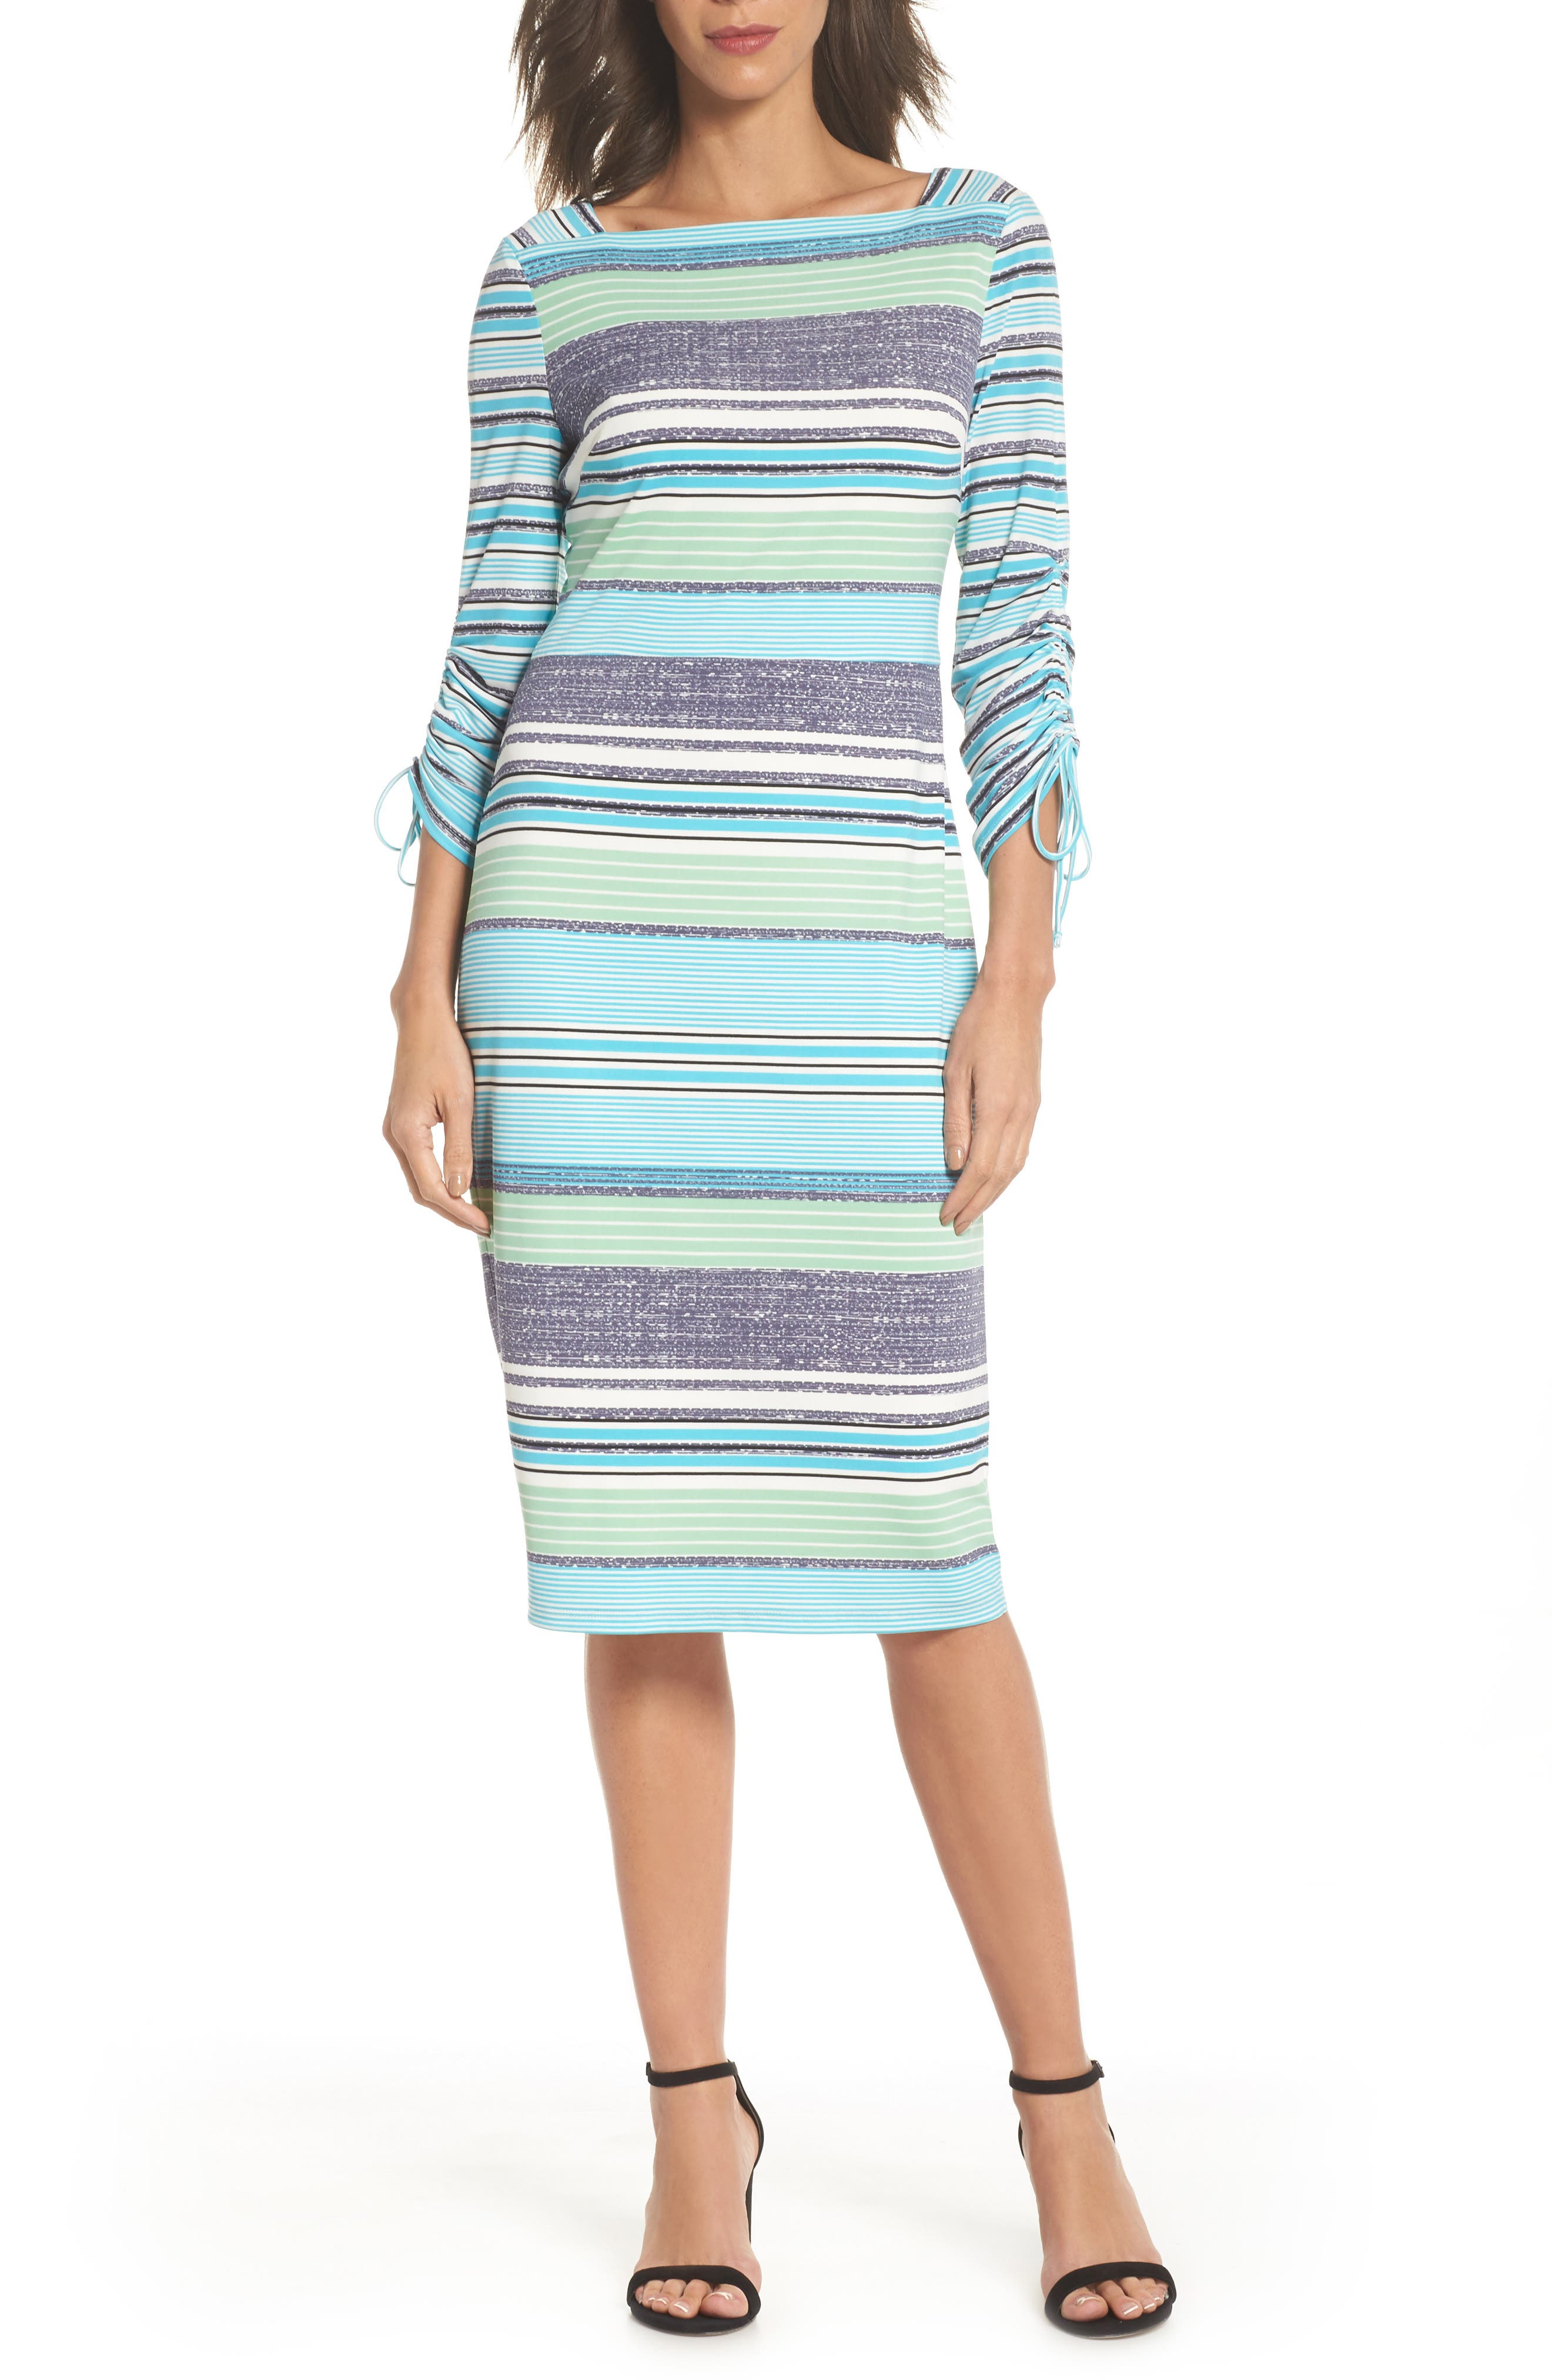 Ruched Sleeve Sheath Dress,                         Main,                         color, White/ Aqua